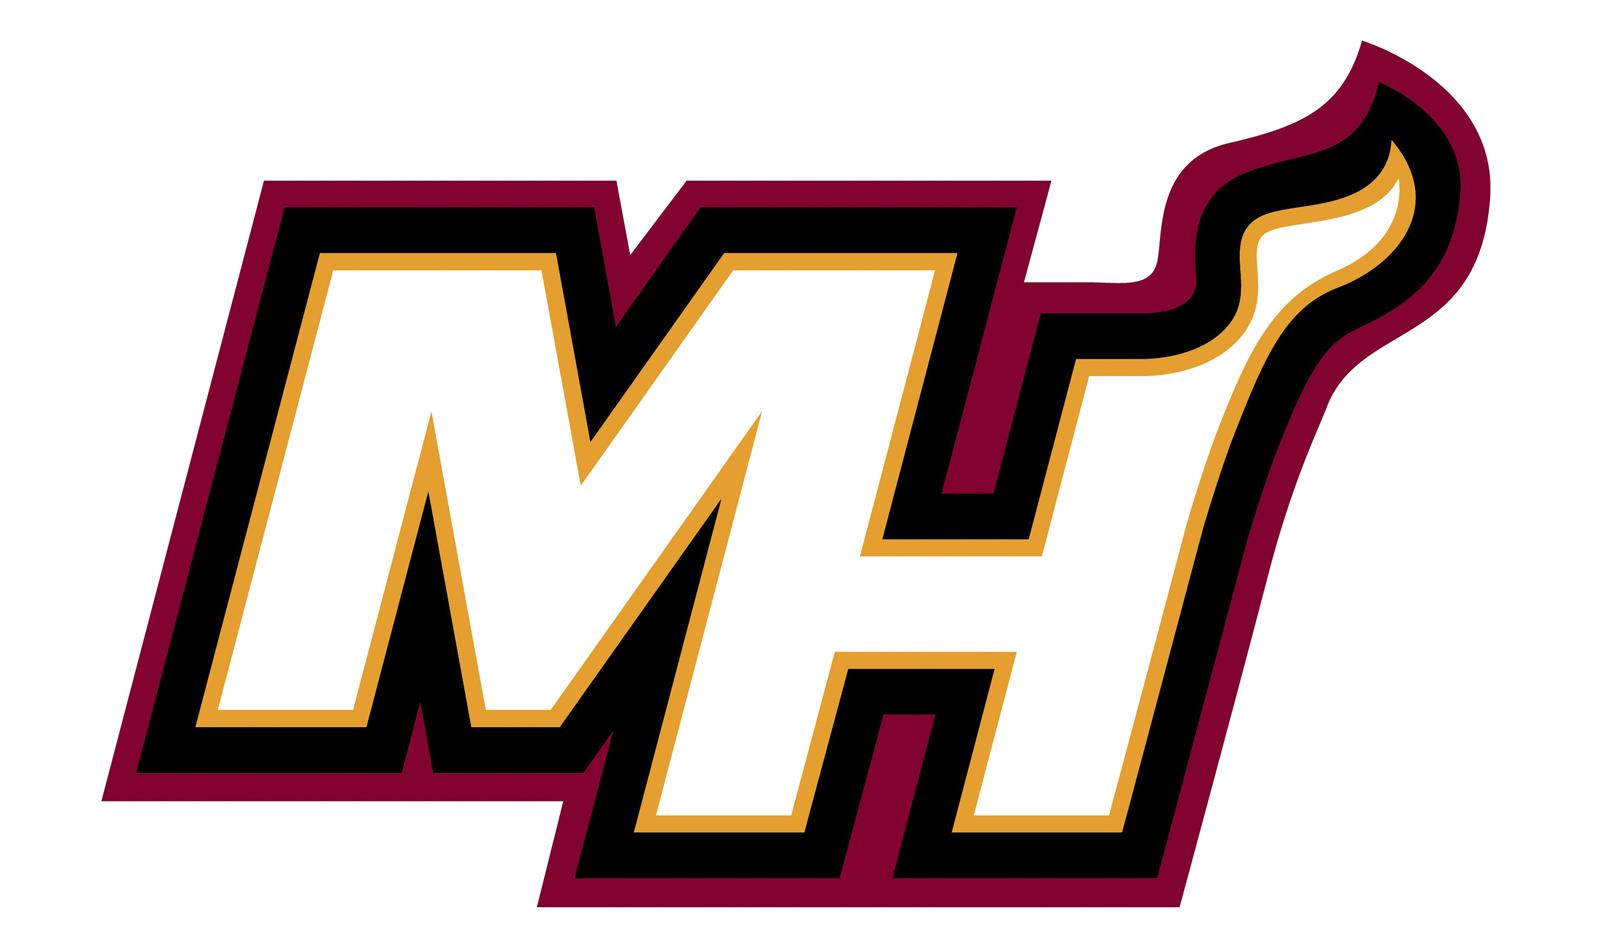 1600x948 Miami Heat Logo, Miami Heat Symbol, Meaning, History And Evolution